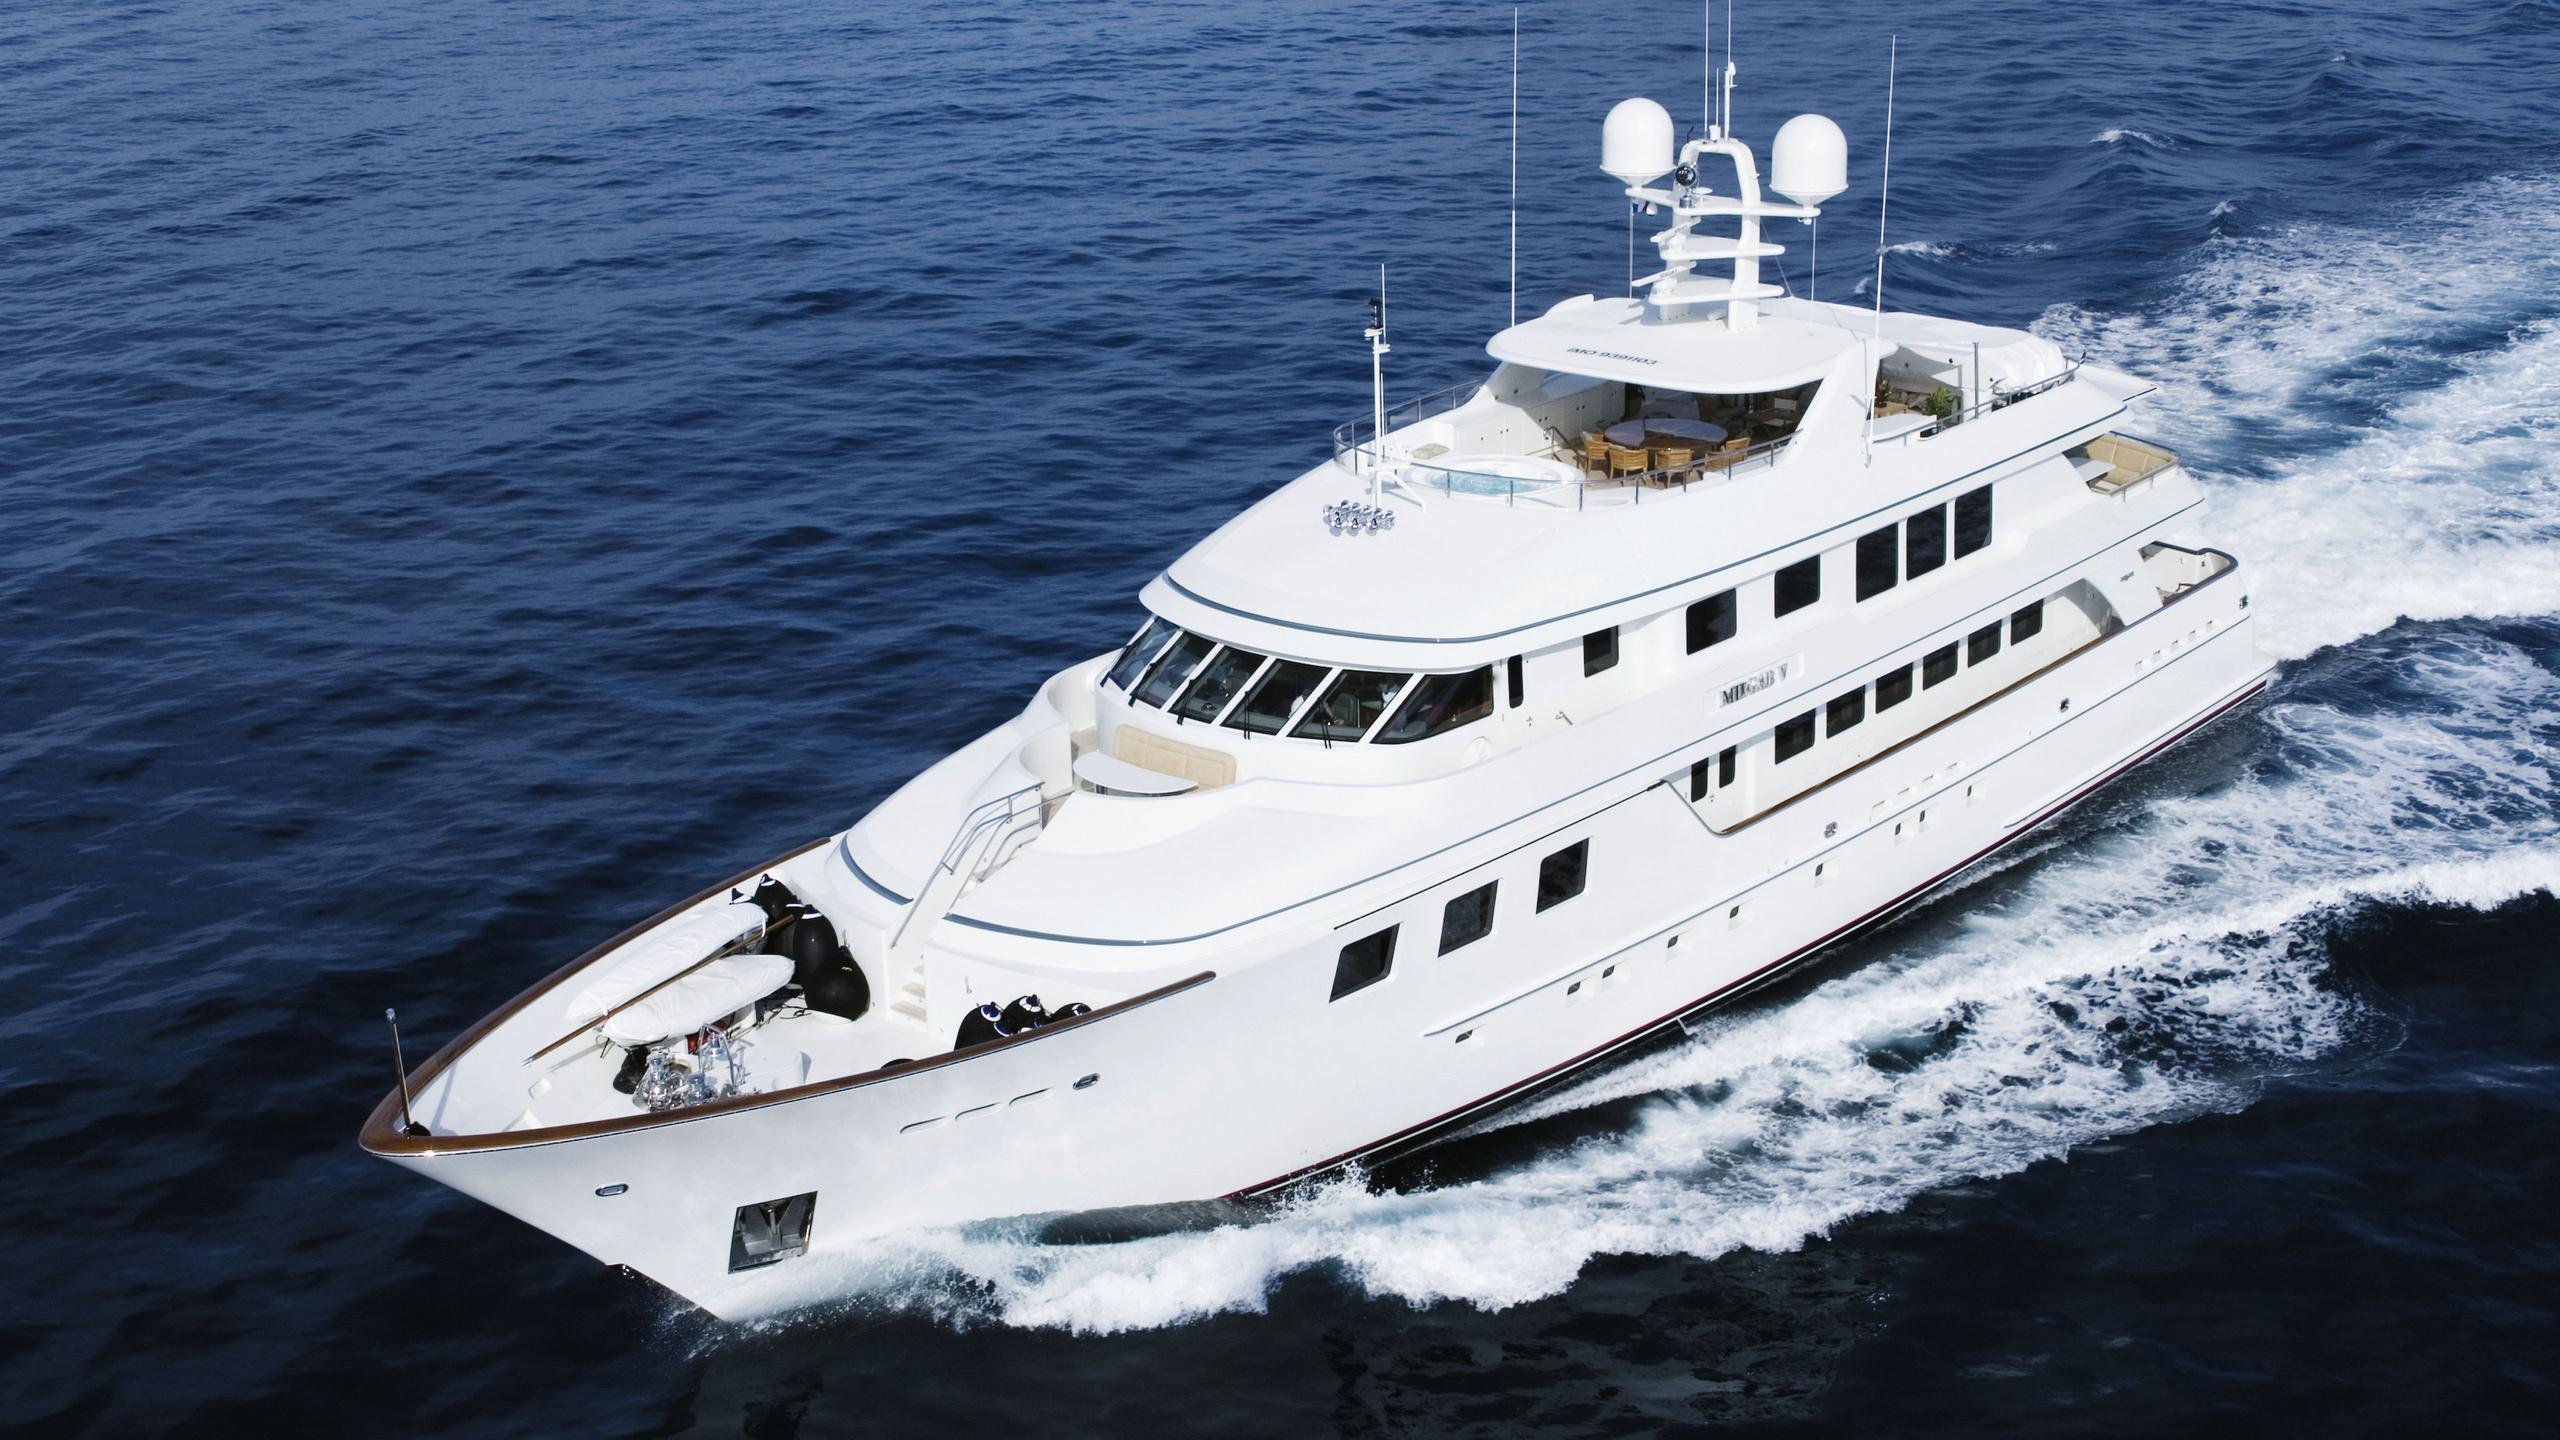 maghreb-v-yacht-cruising